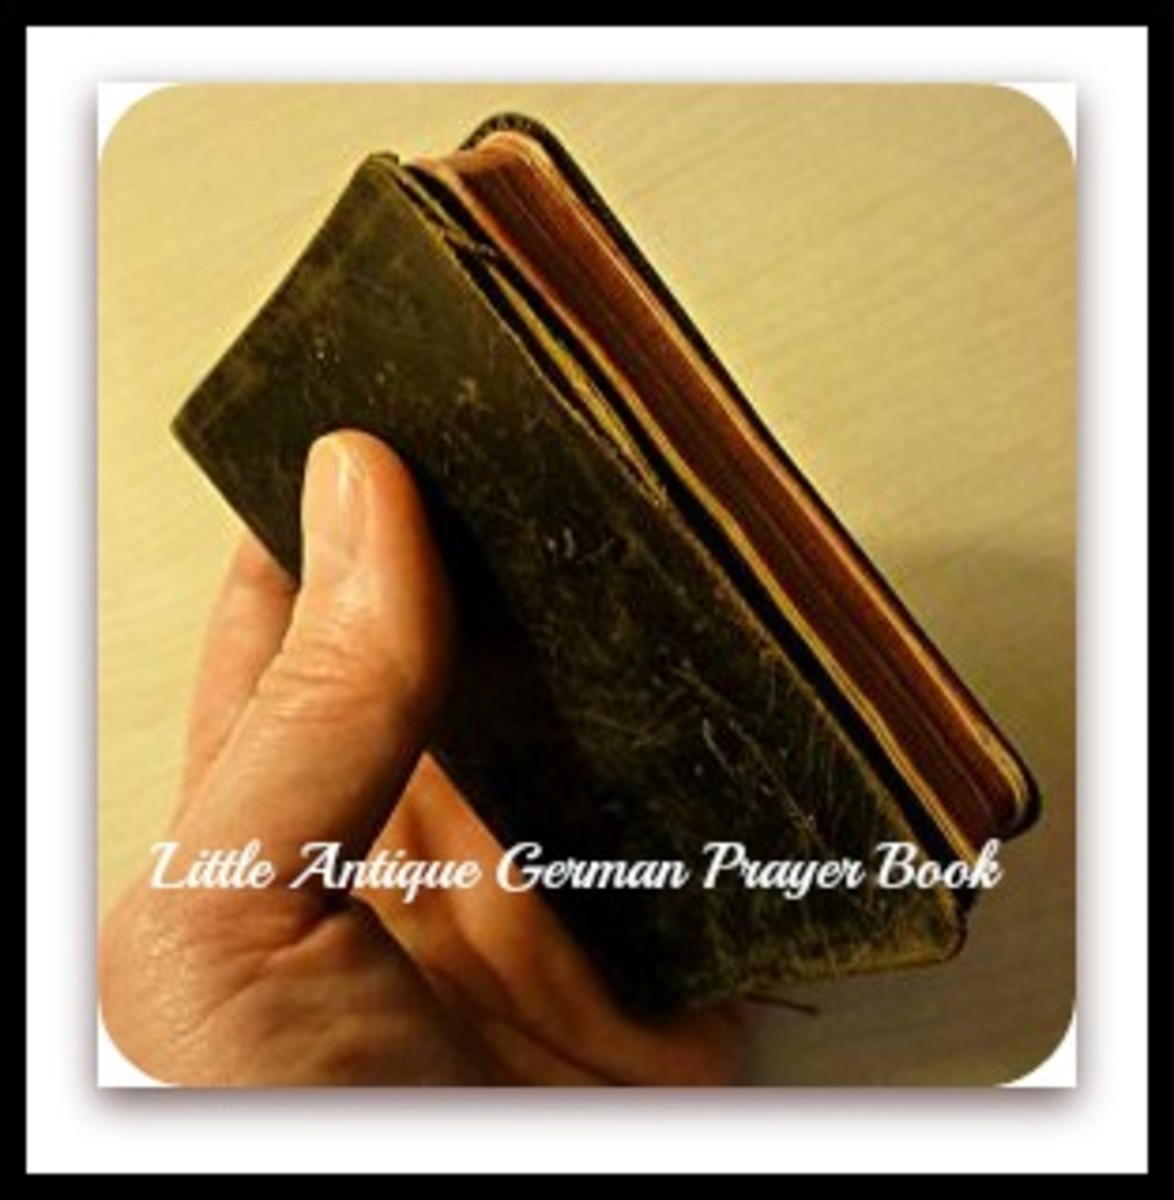 Palm-sized prayer book of my grandmother's.